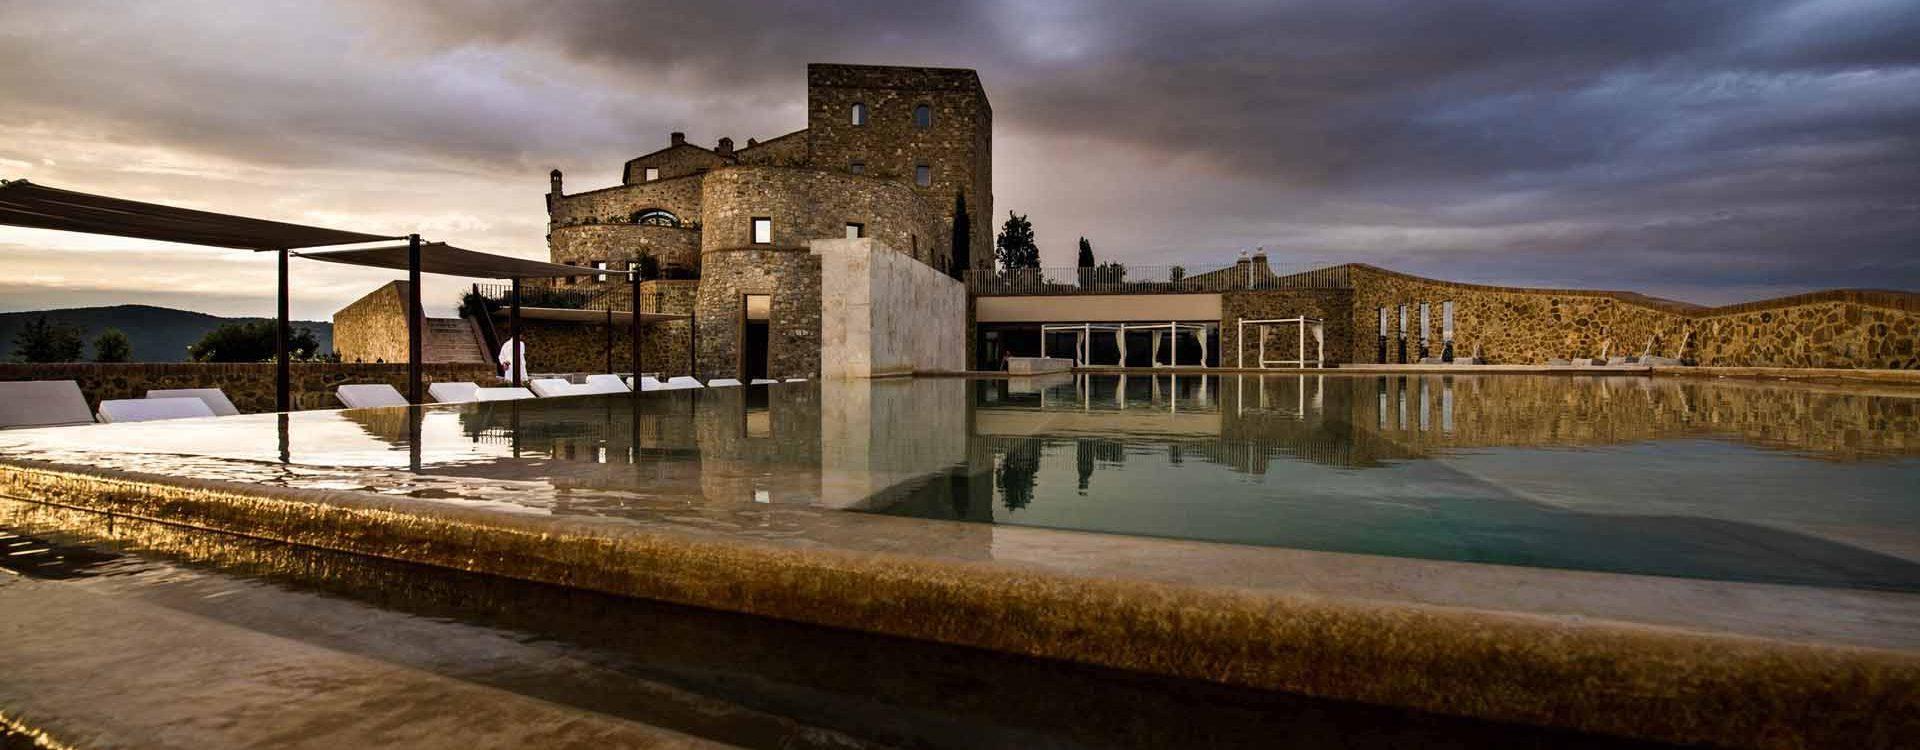 castello di velona resort, thermal spa & winery Montalcino 00014